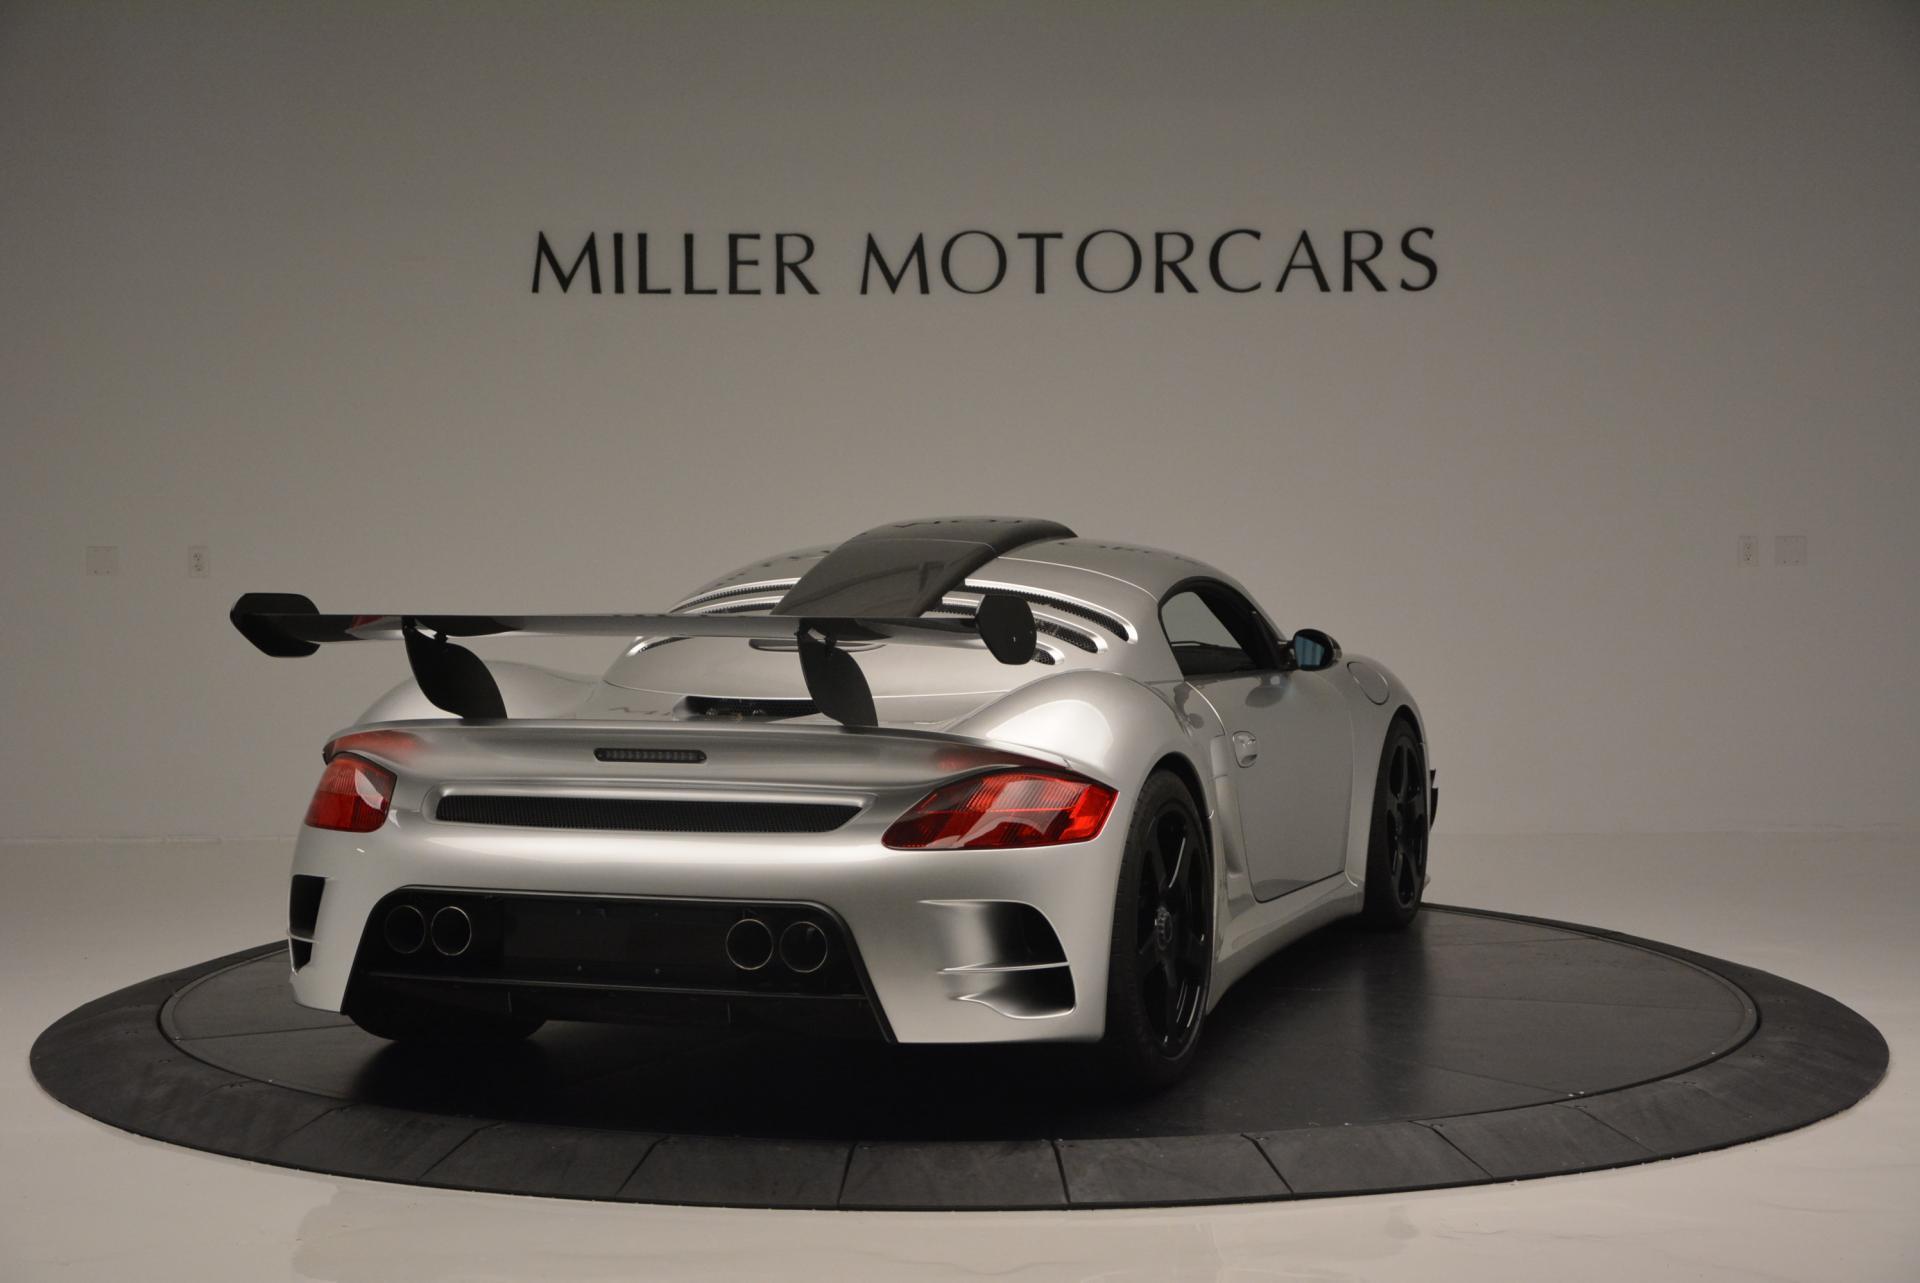 Used 2012 Porsche RUF CTR-3 Clubsport For Sale In Westport, CT 110_p9